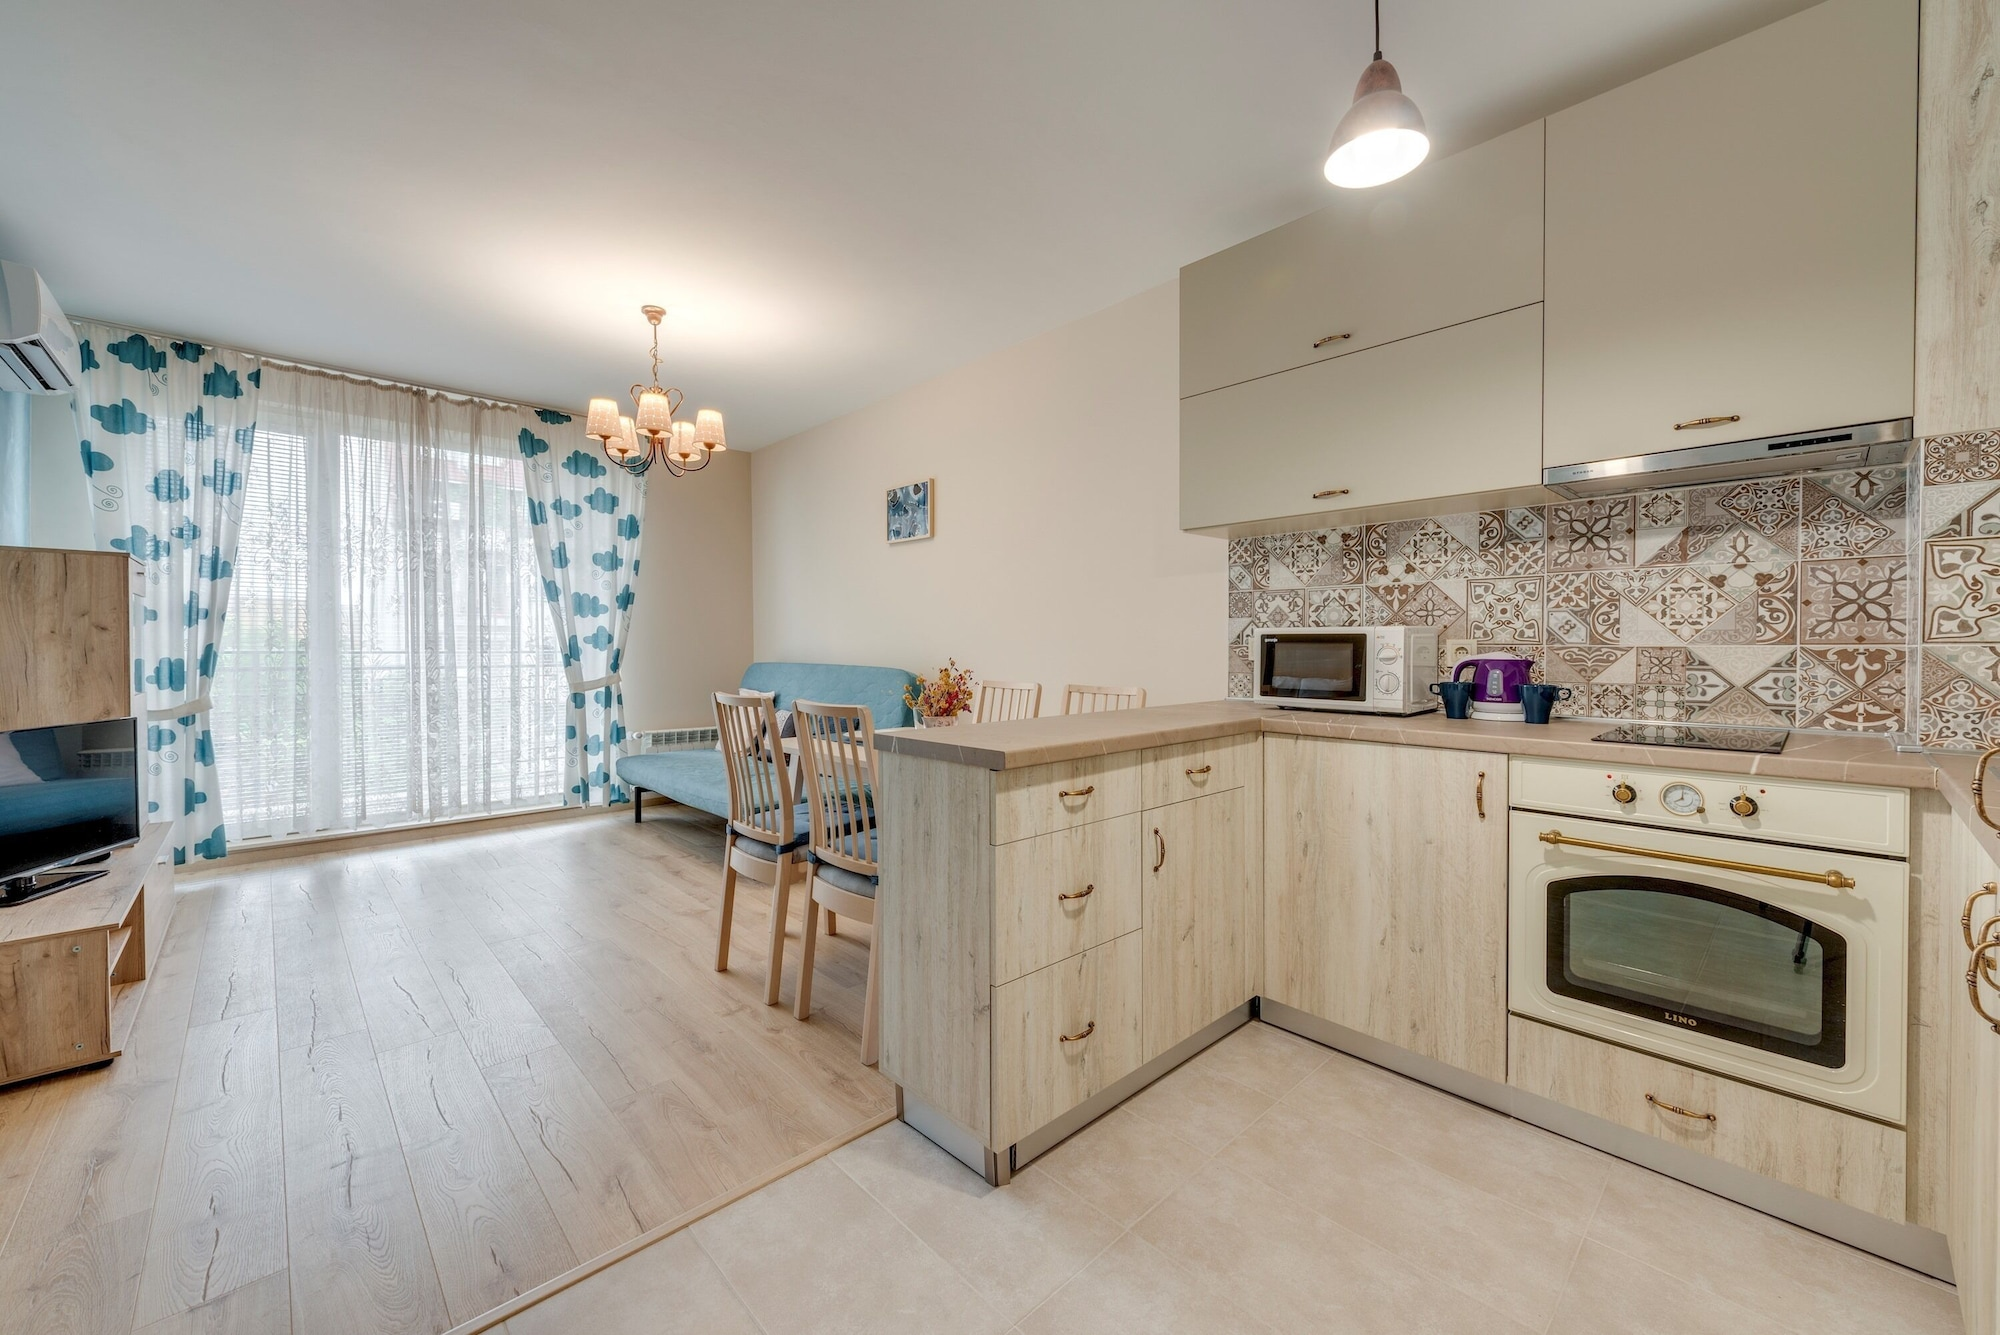 Bright and Newly Refurbished Apartment Near Center, Samokov